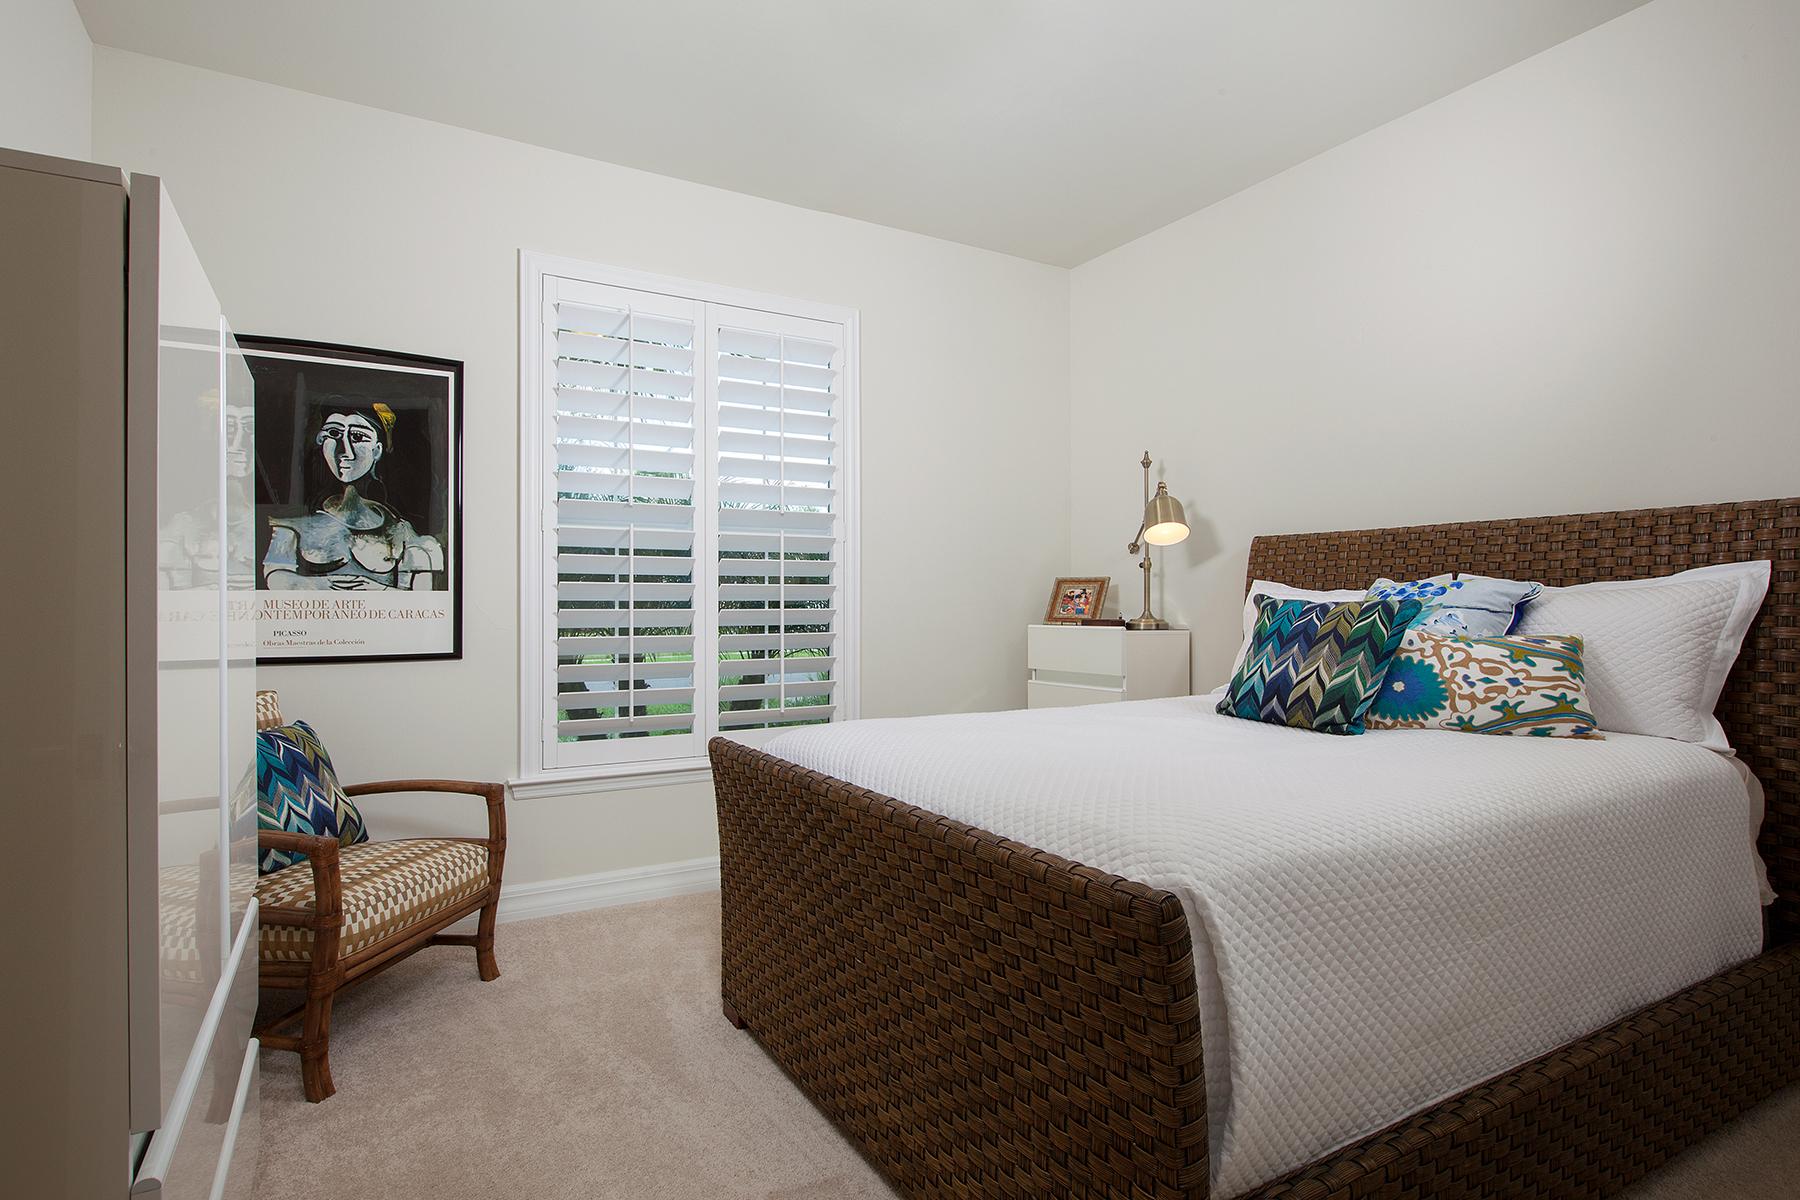 Additional photo for property listing at Bonita Springs 28061  Quiet Water Way,  Bonita Springs, Florida 34135 United States